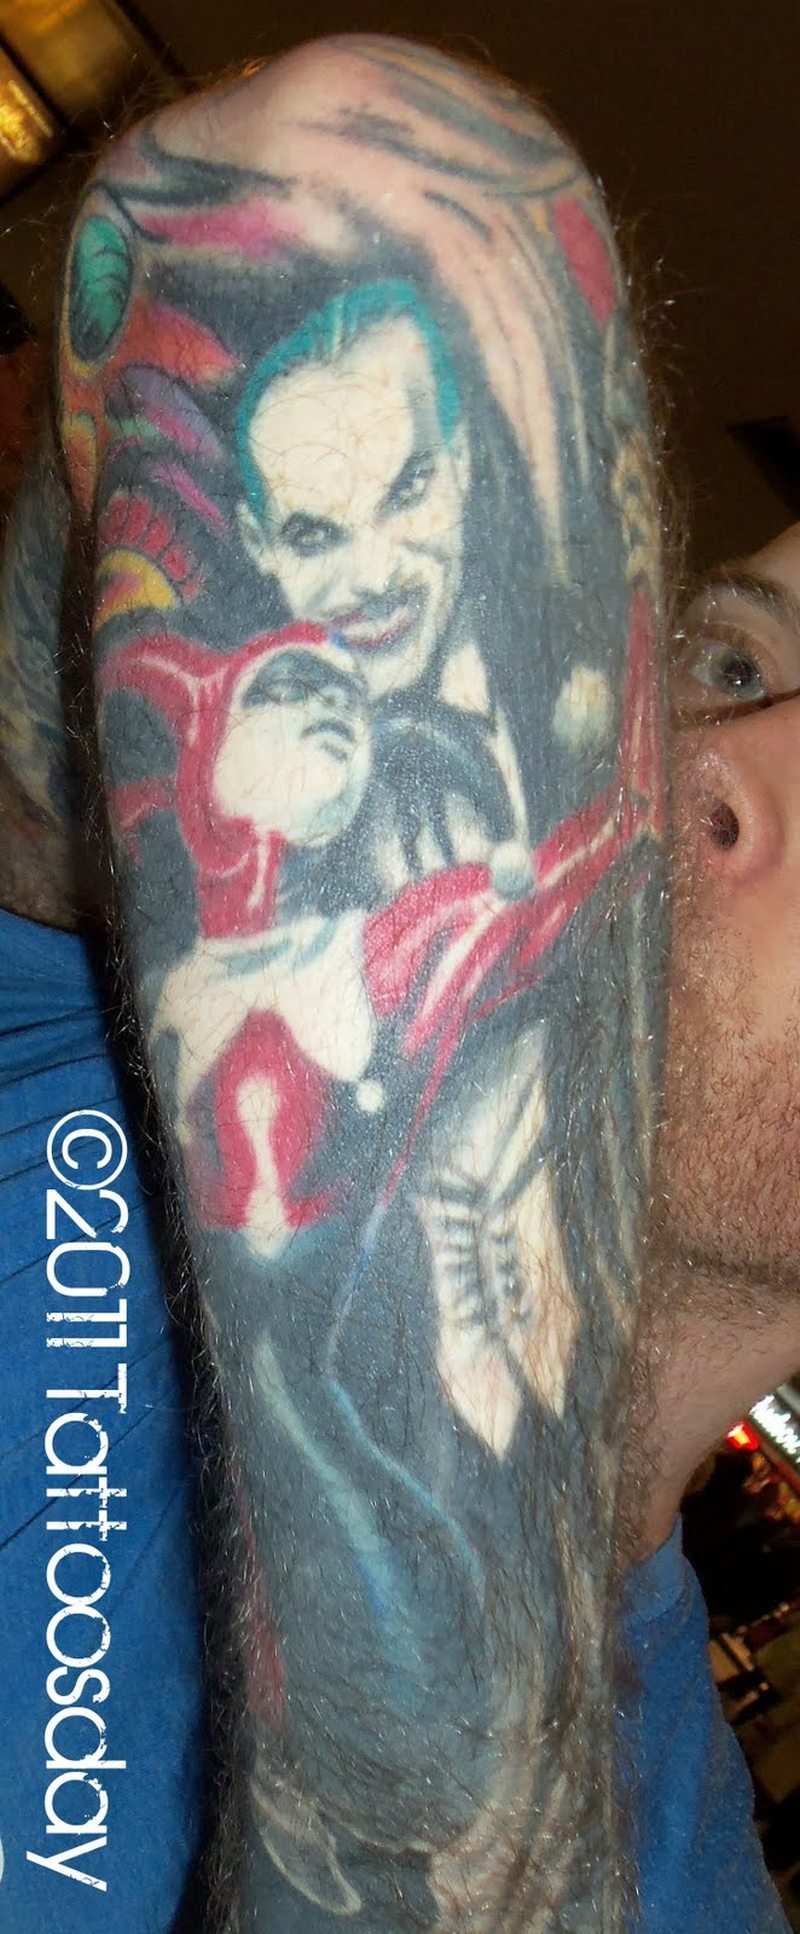 Harley joker tattoo on arm